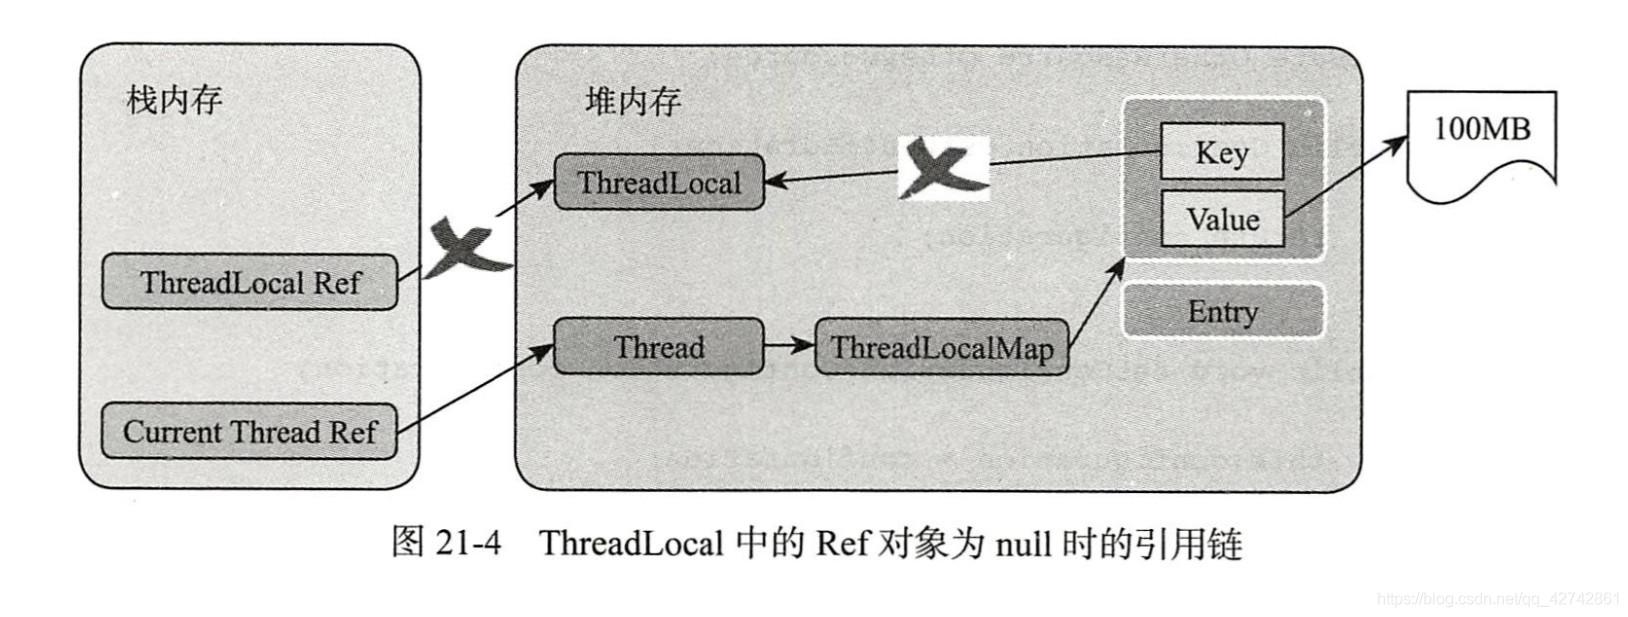 ThreadLocal中的Ref对象为null时的引用链